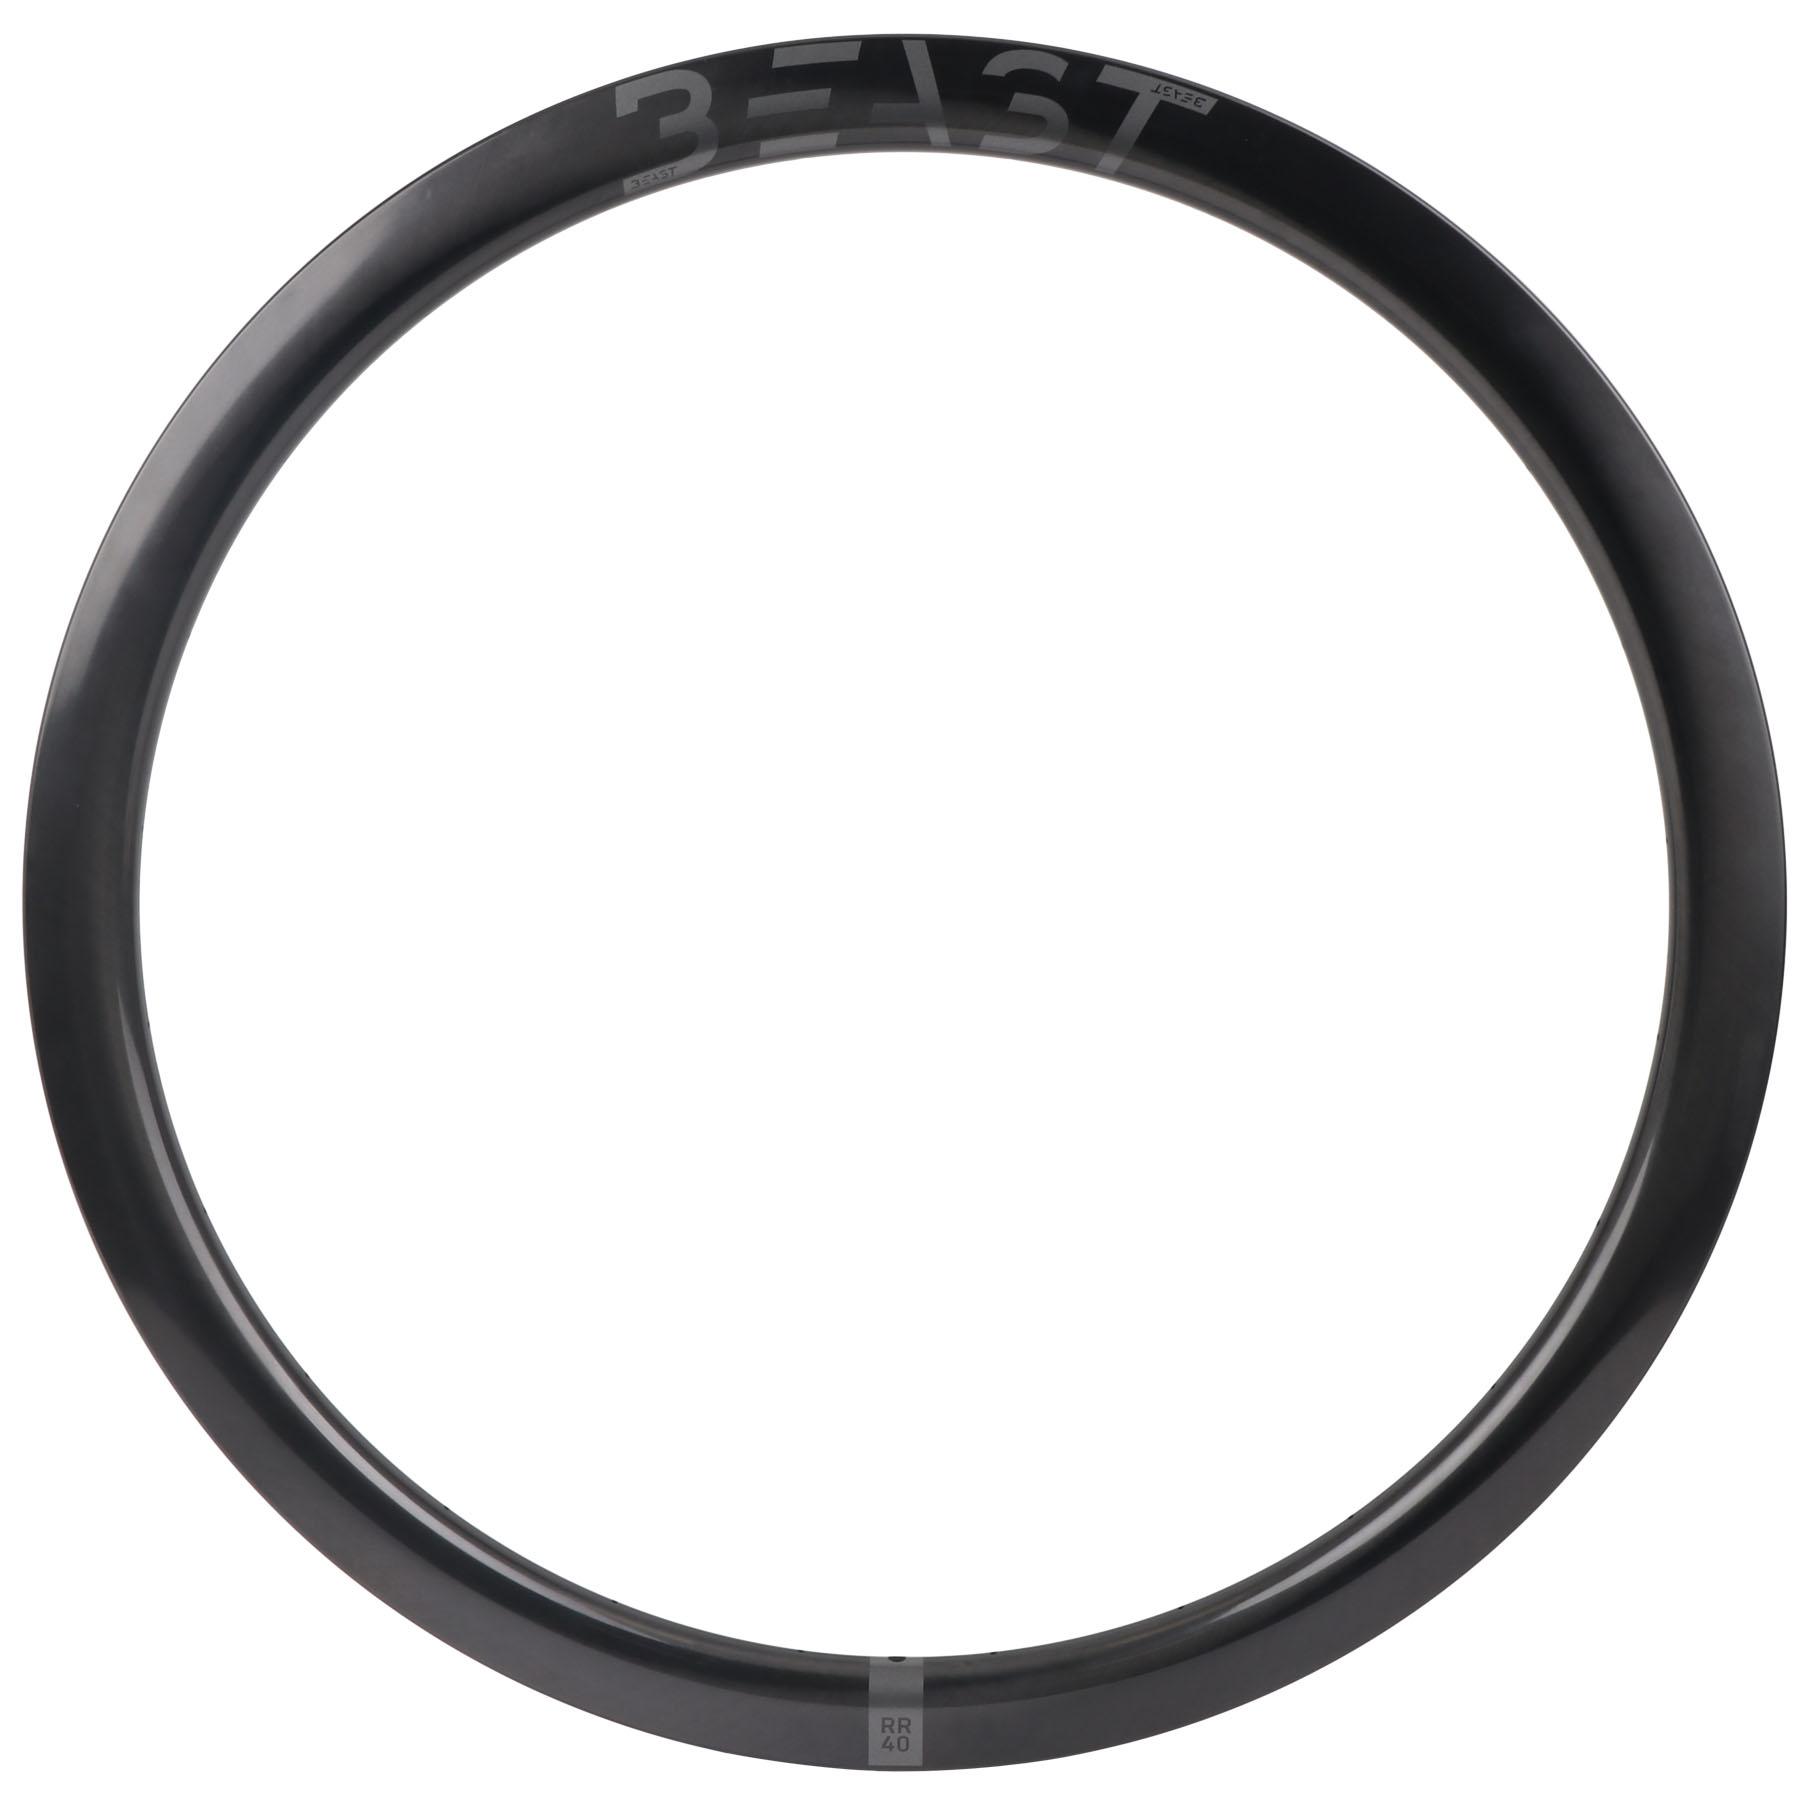 Beast Components RR40 Carbon Disc Clincher Rim - 20-622 - 24 Hole - UD black